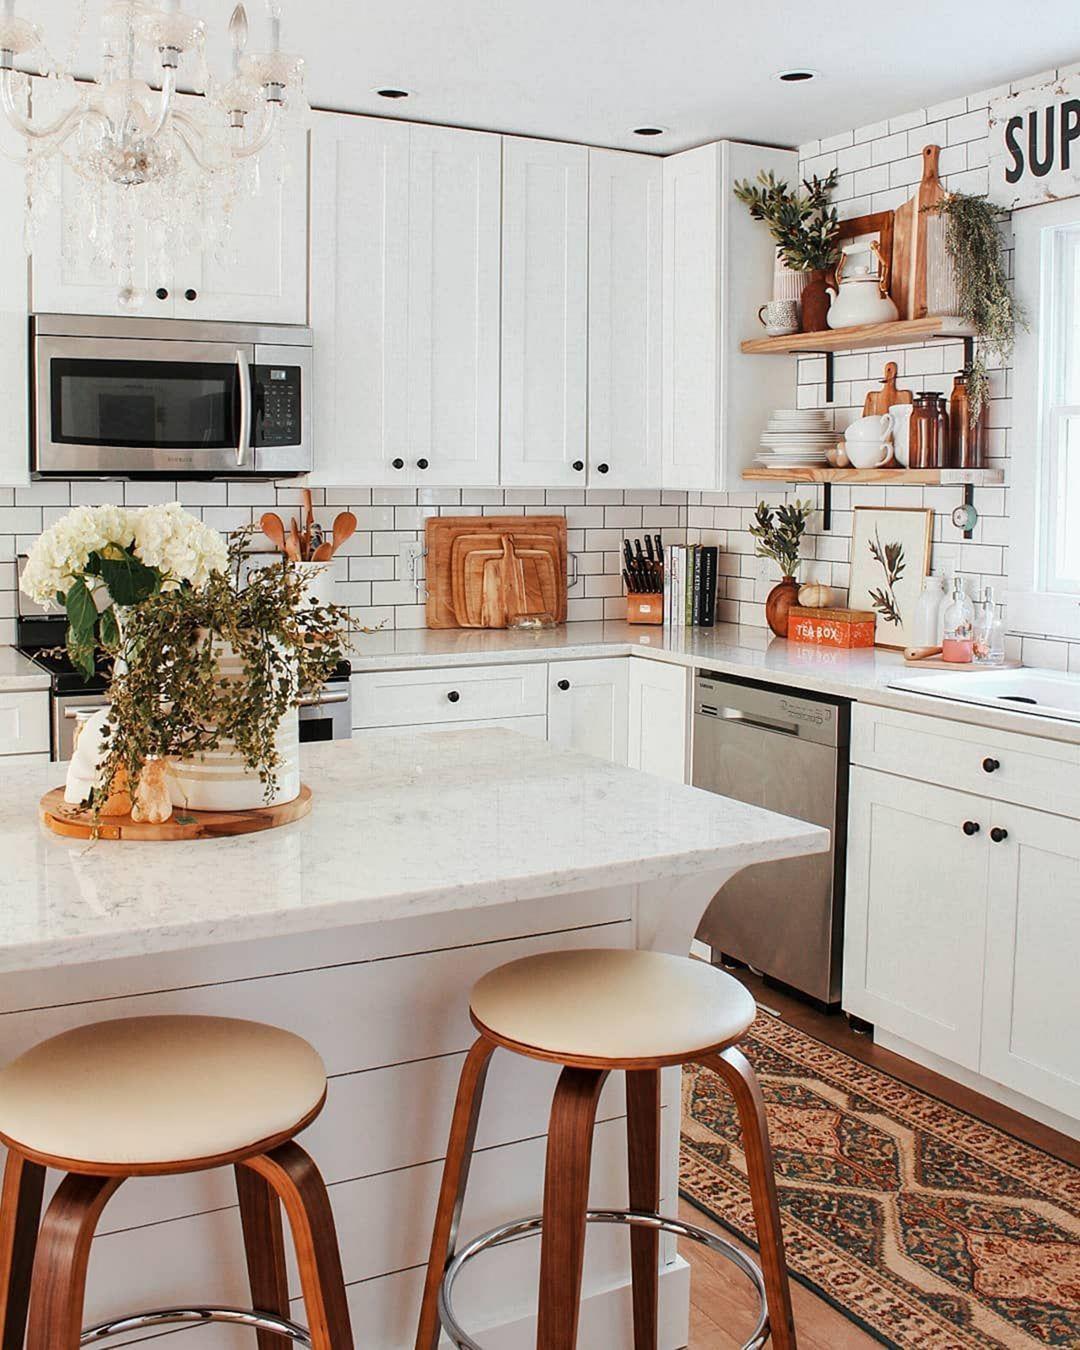 15 Chic Farmhouse Kitchen Design And Decorating Ideas For Fun Cooking Decor It S Farmhouse Kitchen Design Home Kitchens Kitchen Inspirations Pinterest kitchen decorating ideas